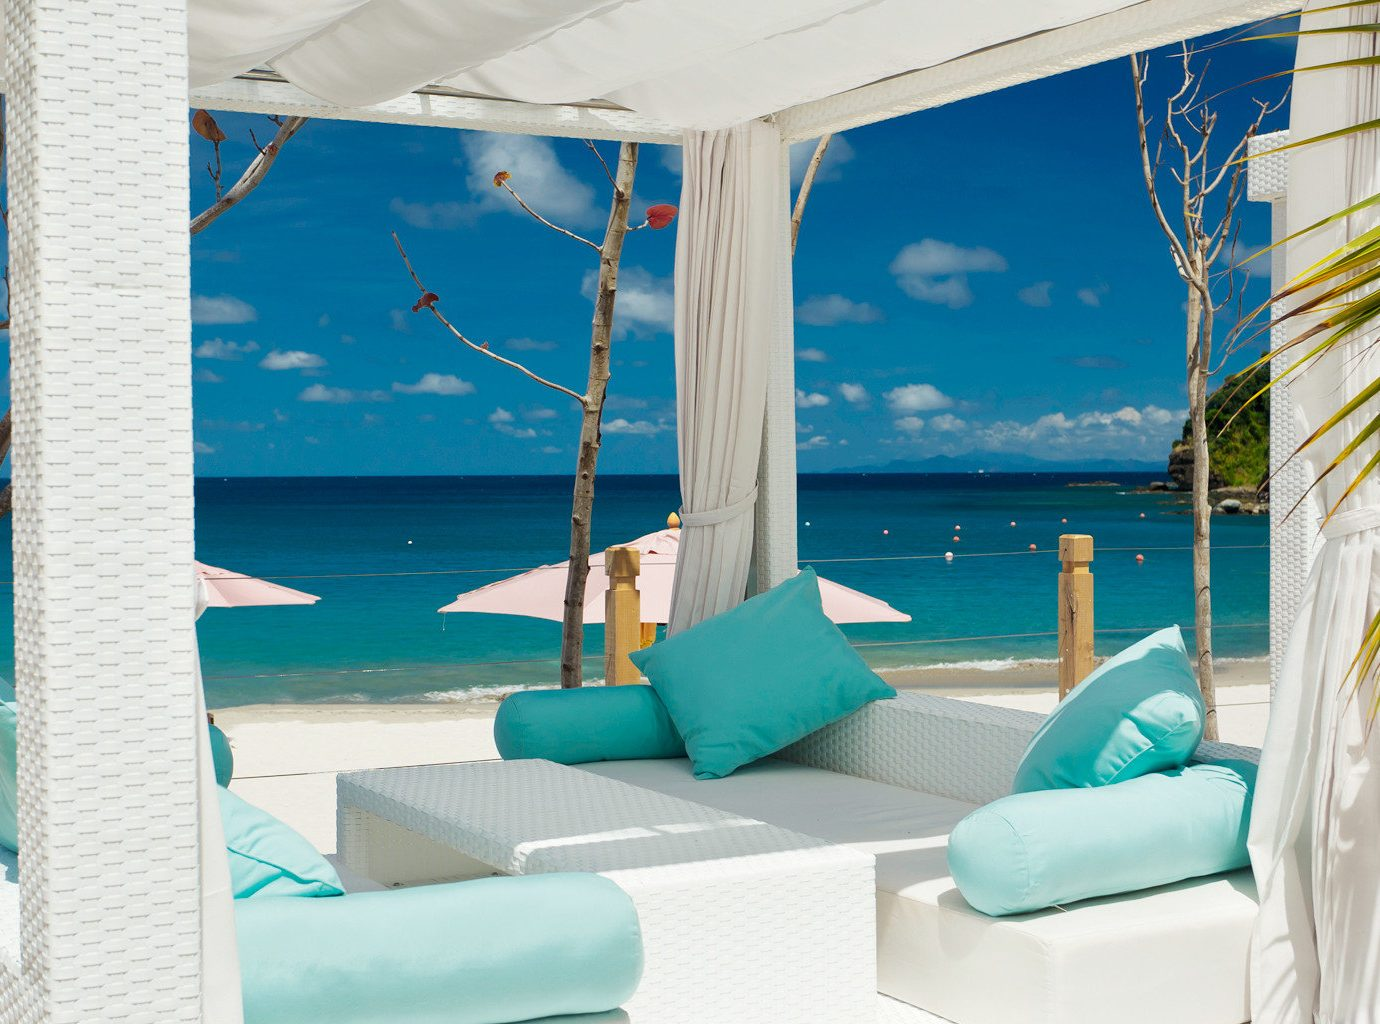 Hotels blue room chair swimming pool caribbean vacation Resort interior design estate Villa apartment furniture several